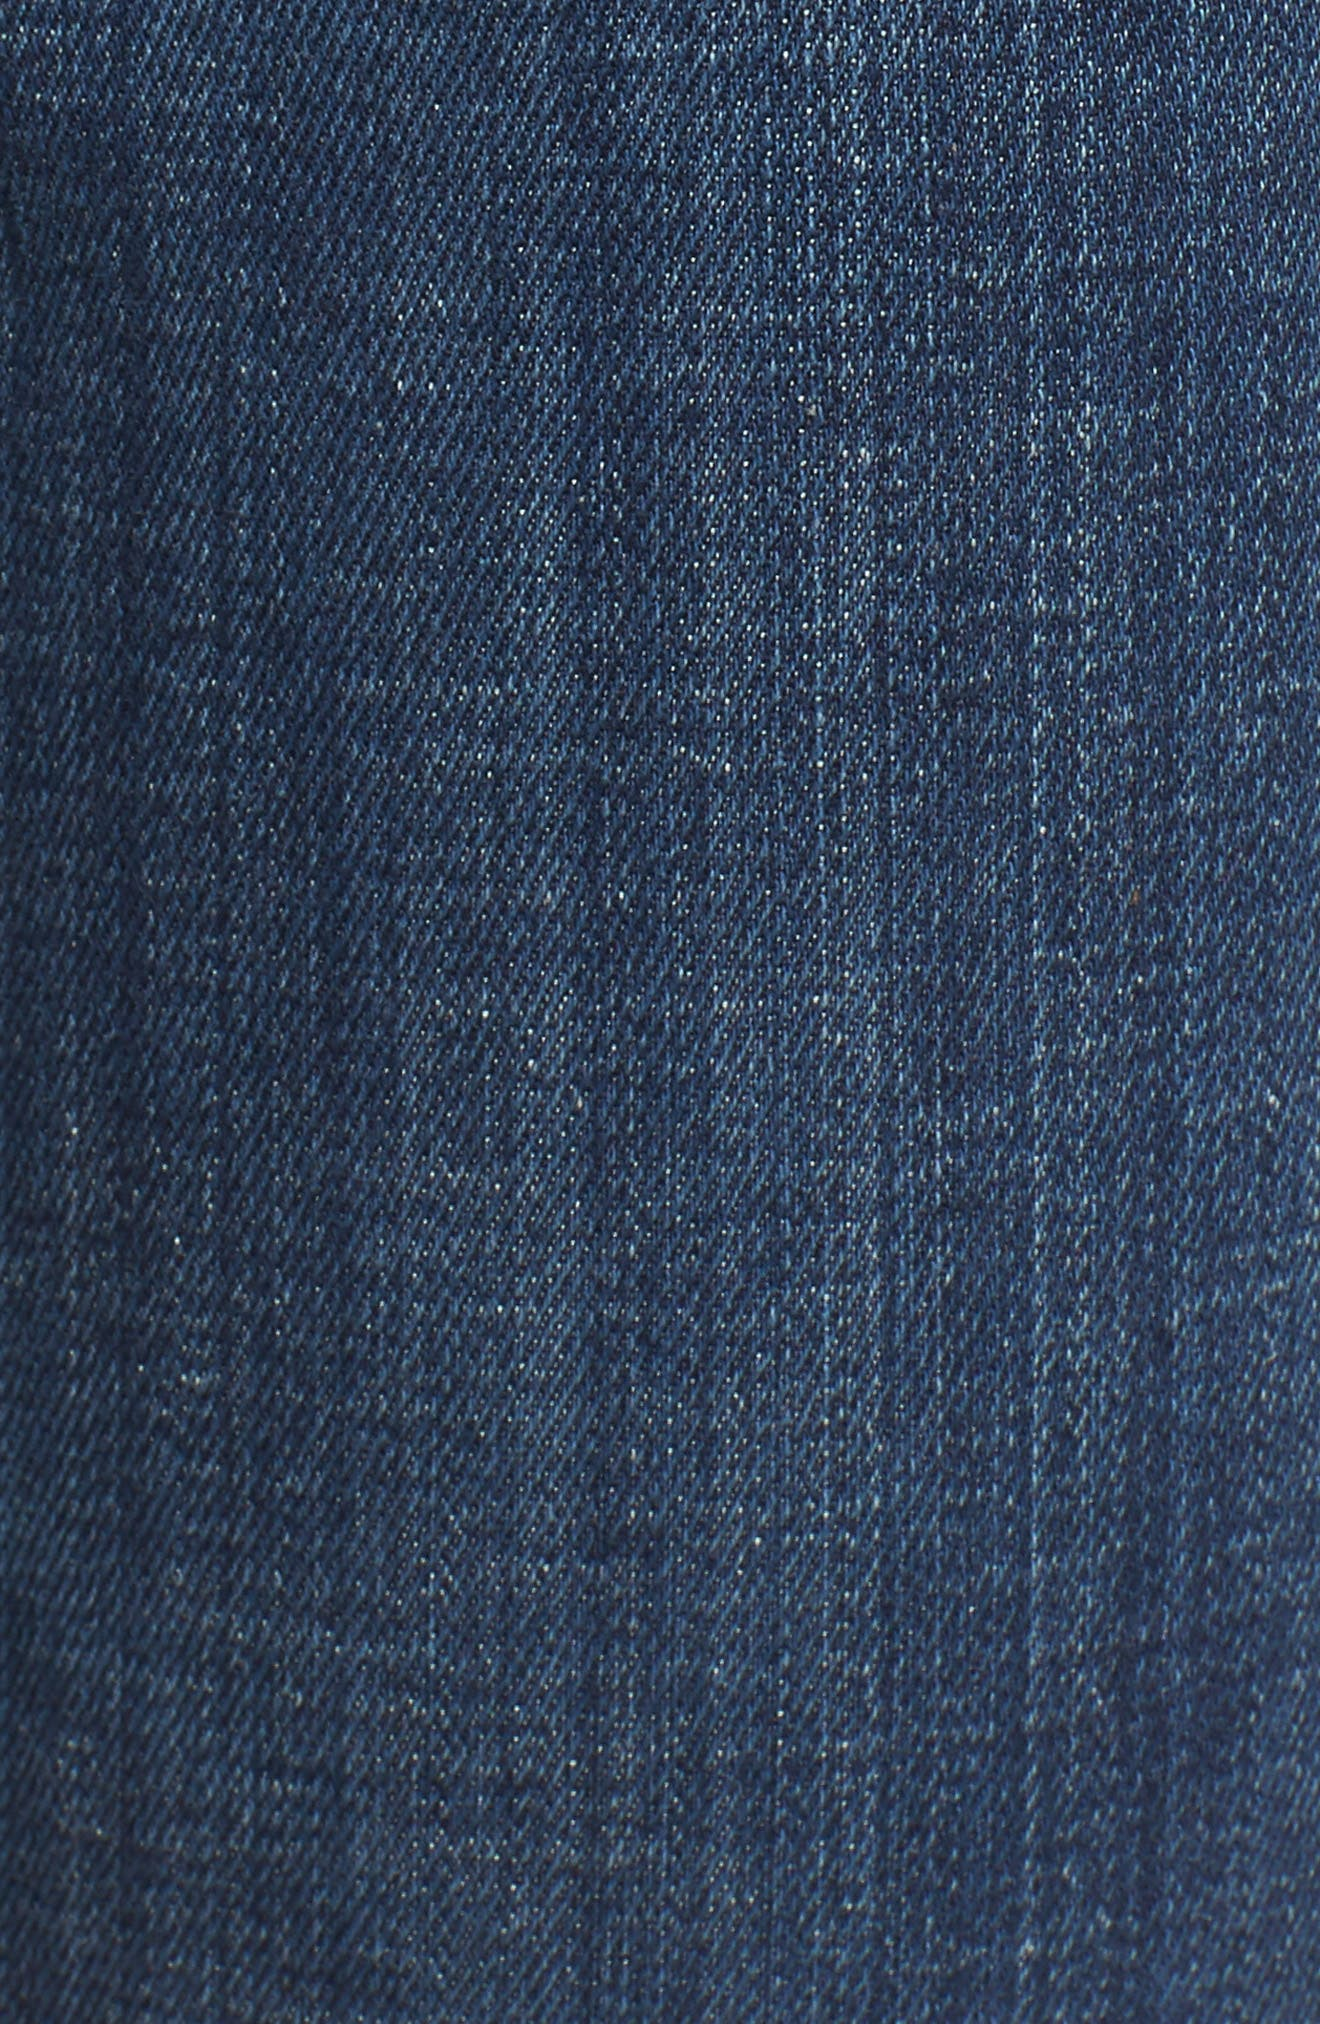 Halle Skinny Jeans,                             Alternate thumbnail 6, color,                             402